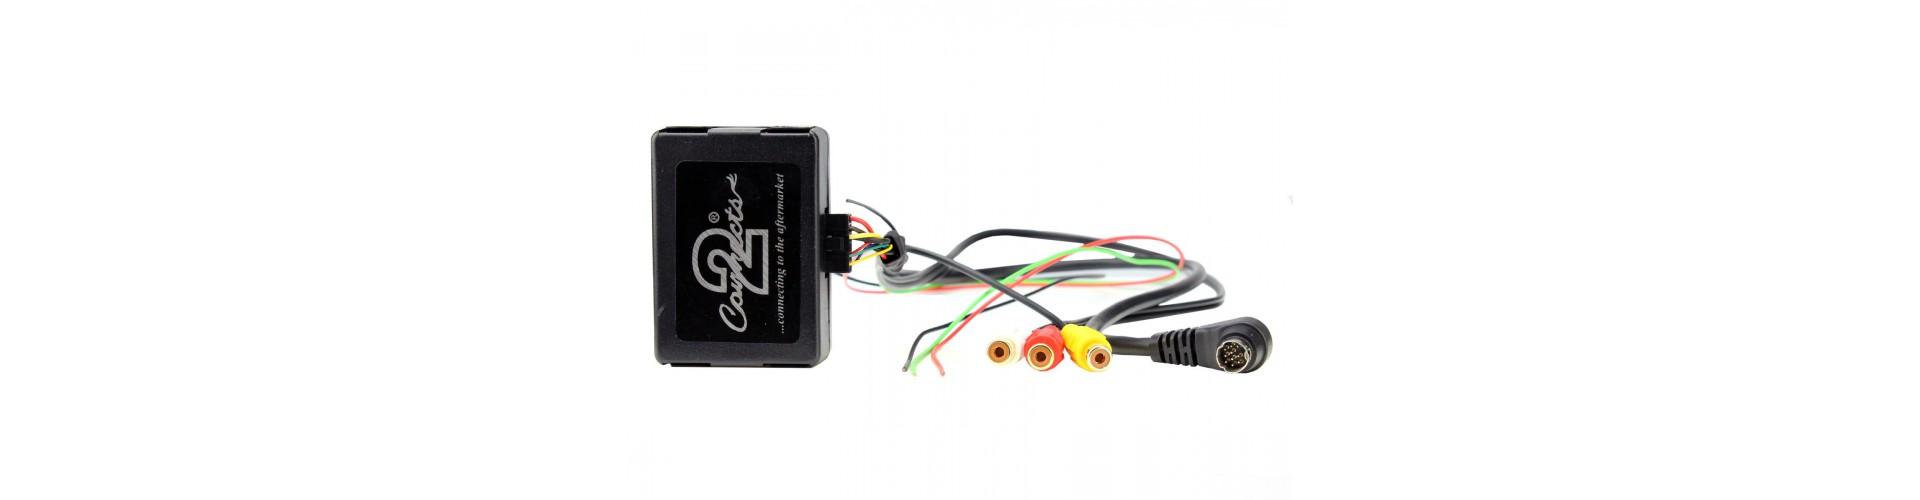 Factory Vehicle Radio Camera Add-On Interface